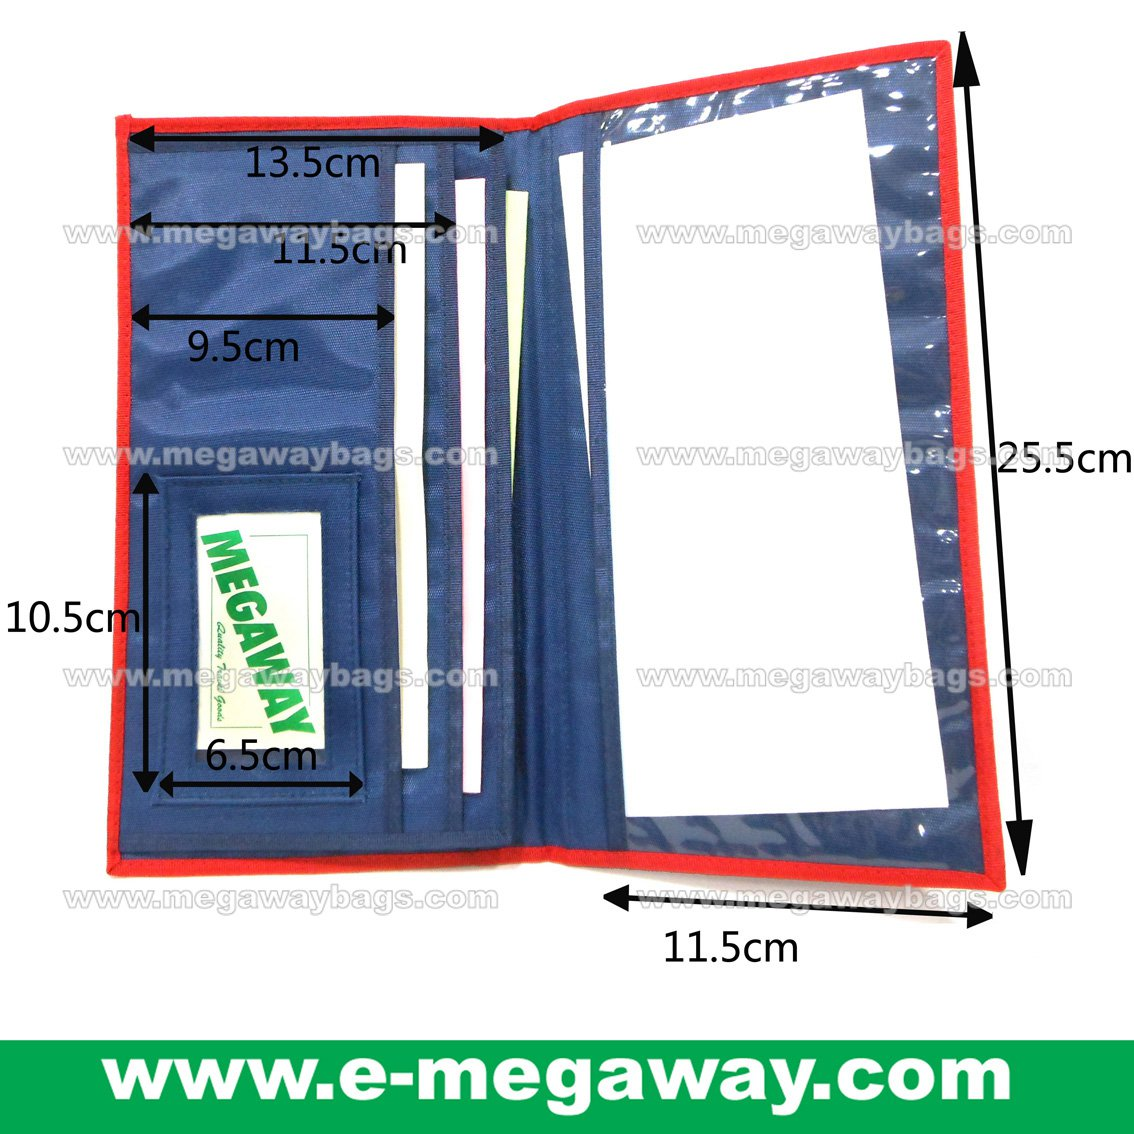 Travel Wallets Bag Money Air Tickets Credit Cards Passport Organizer MegawayBags #CC-0933A-7125